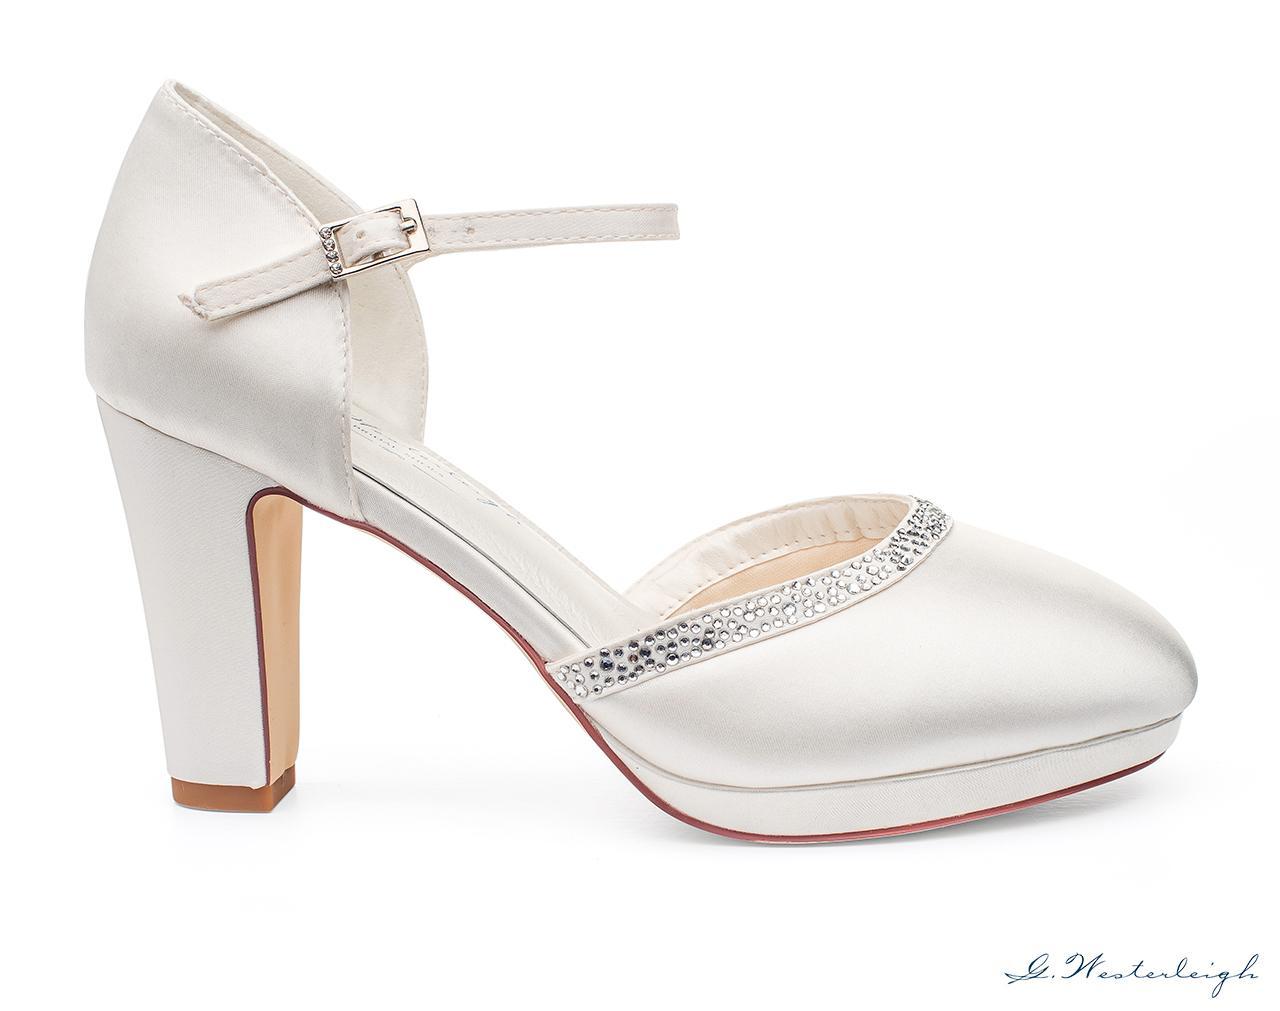 Svadobné topánky Gabrielle - Obrázok č. 3